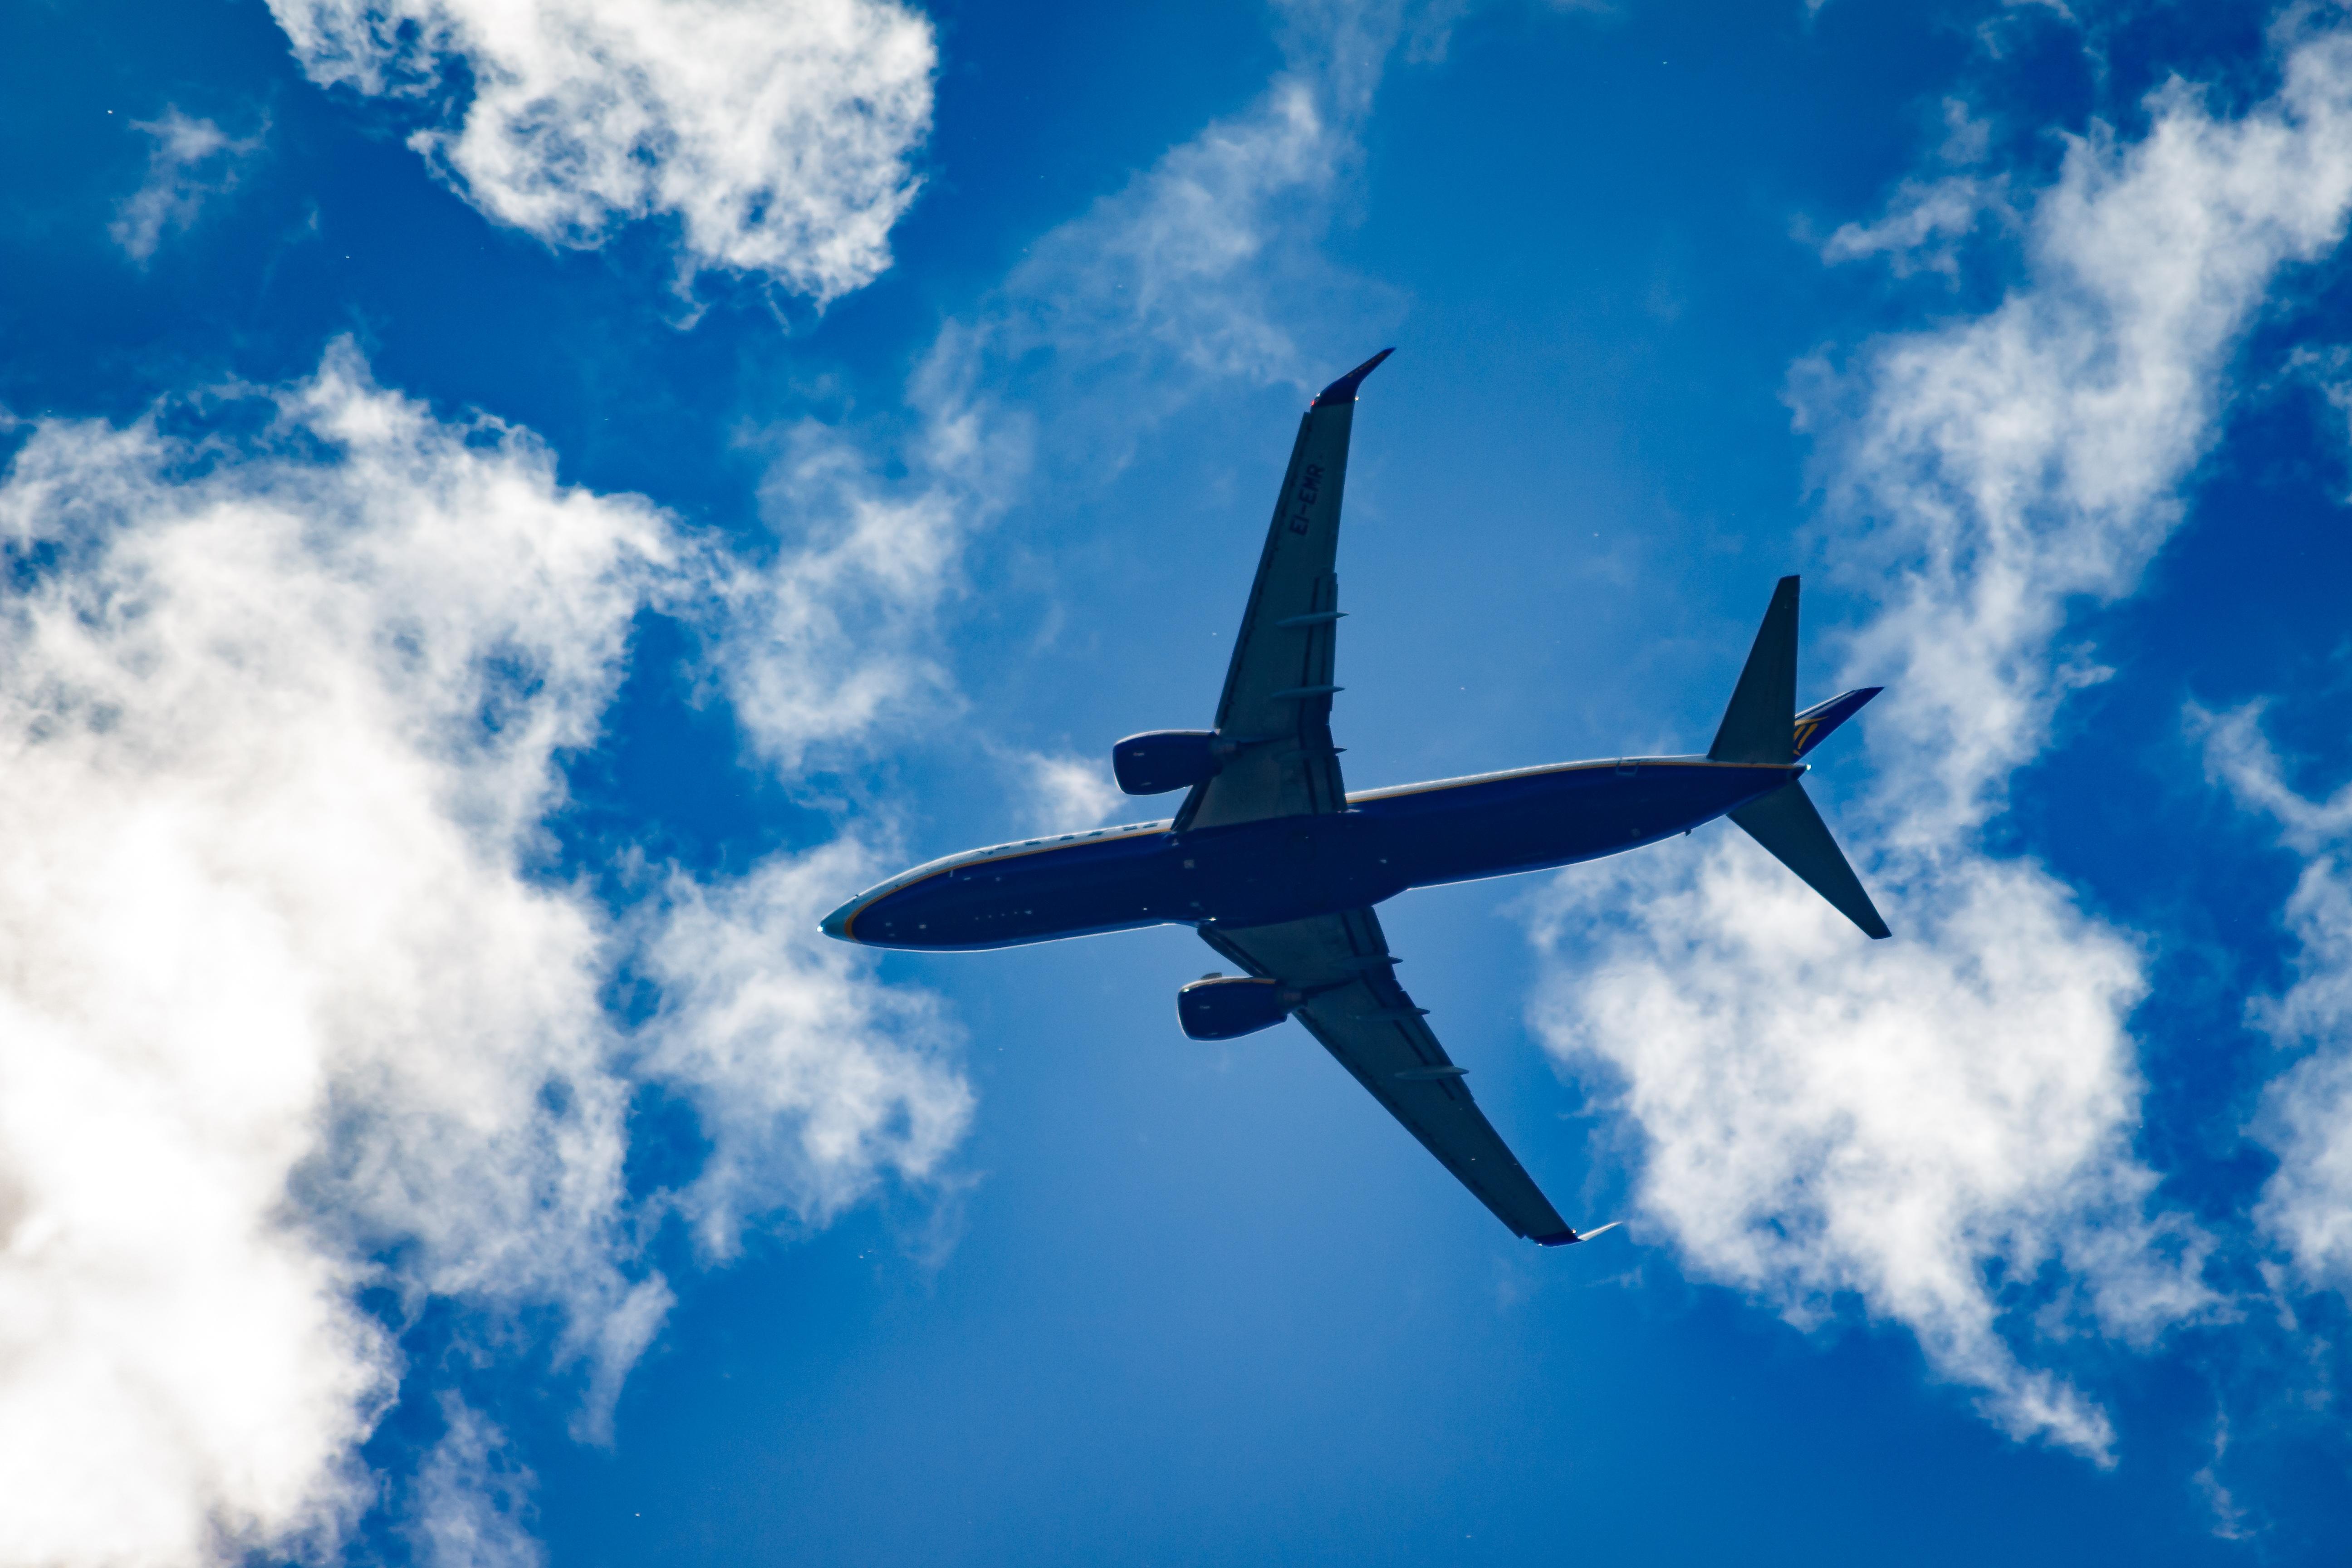 Gratis Afbeeldingen Vleugel Wolk Hemel Vlieg Reizen Vliegtuig